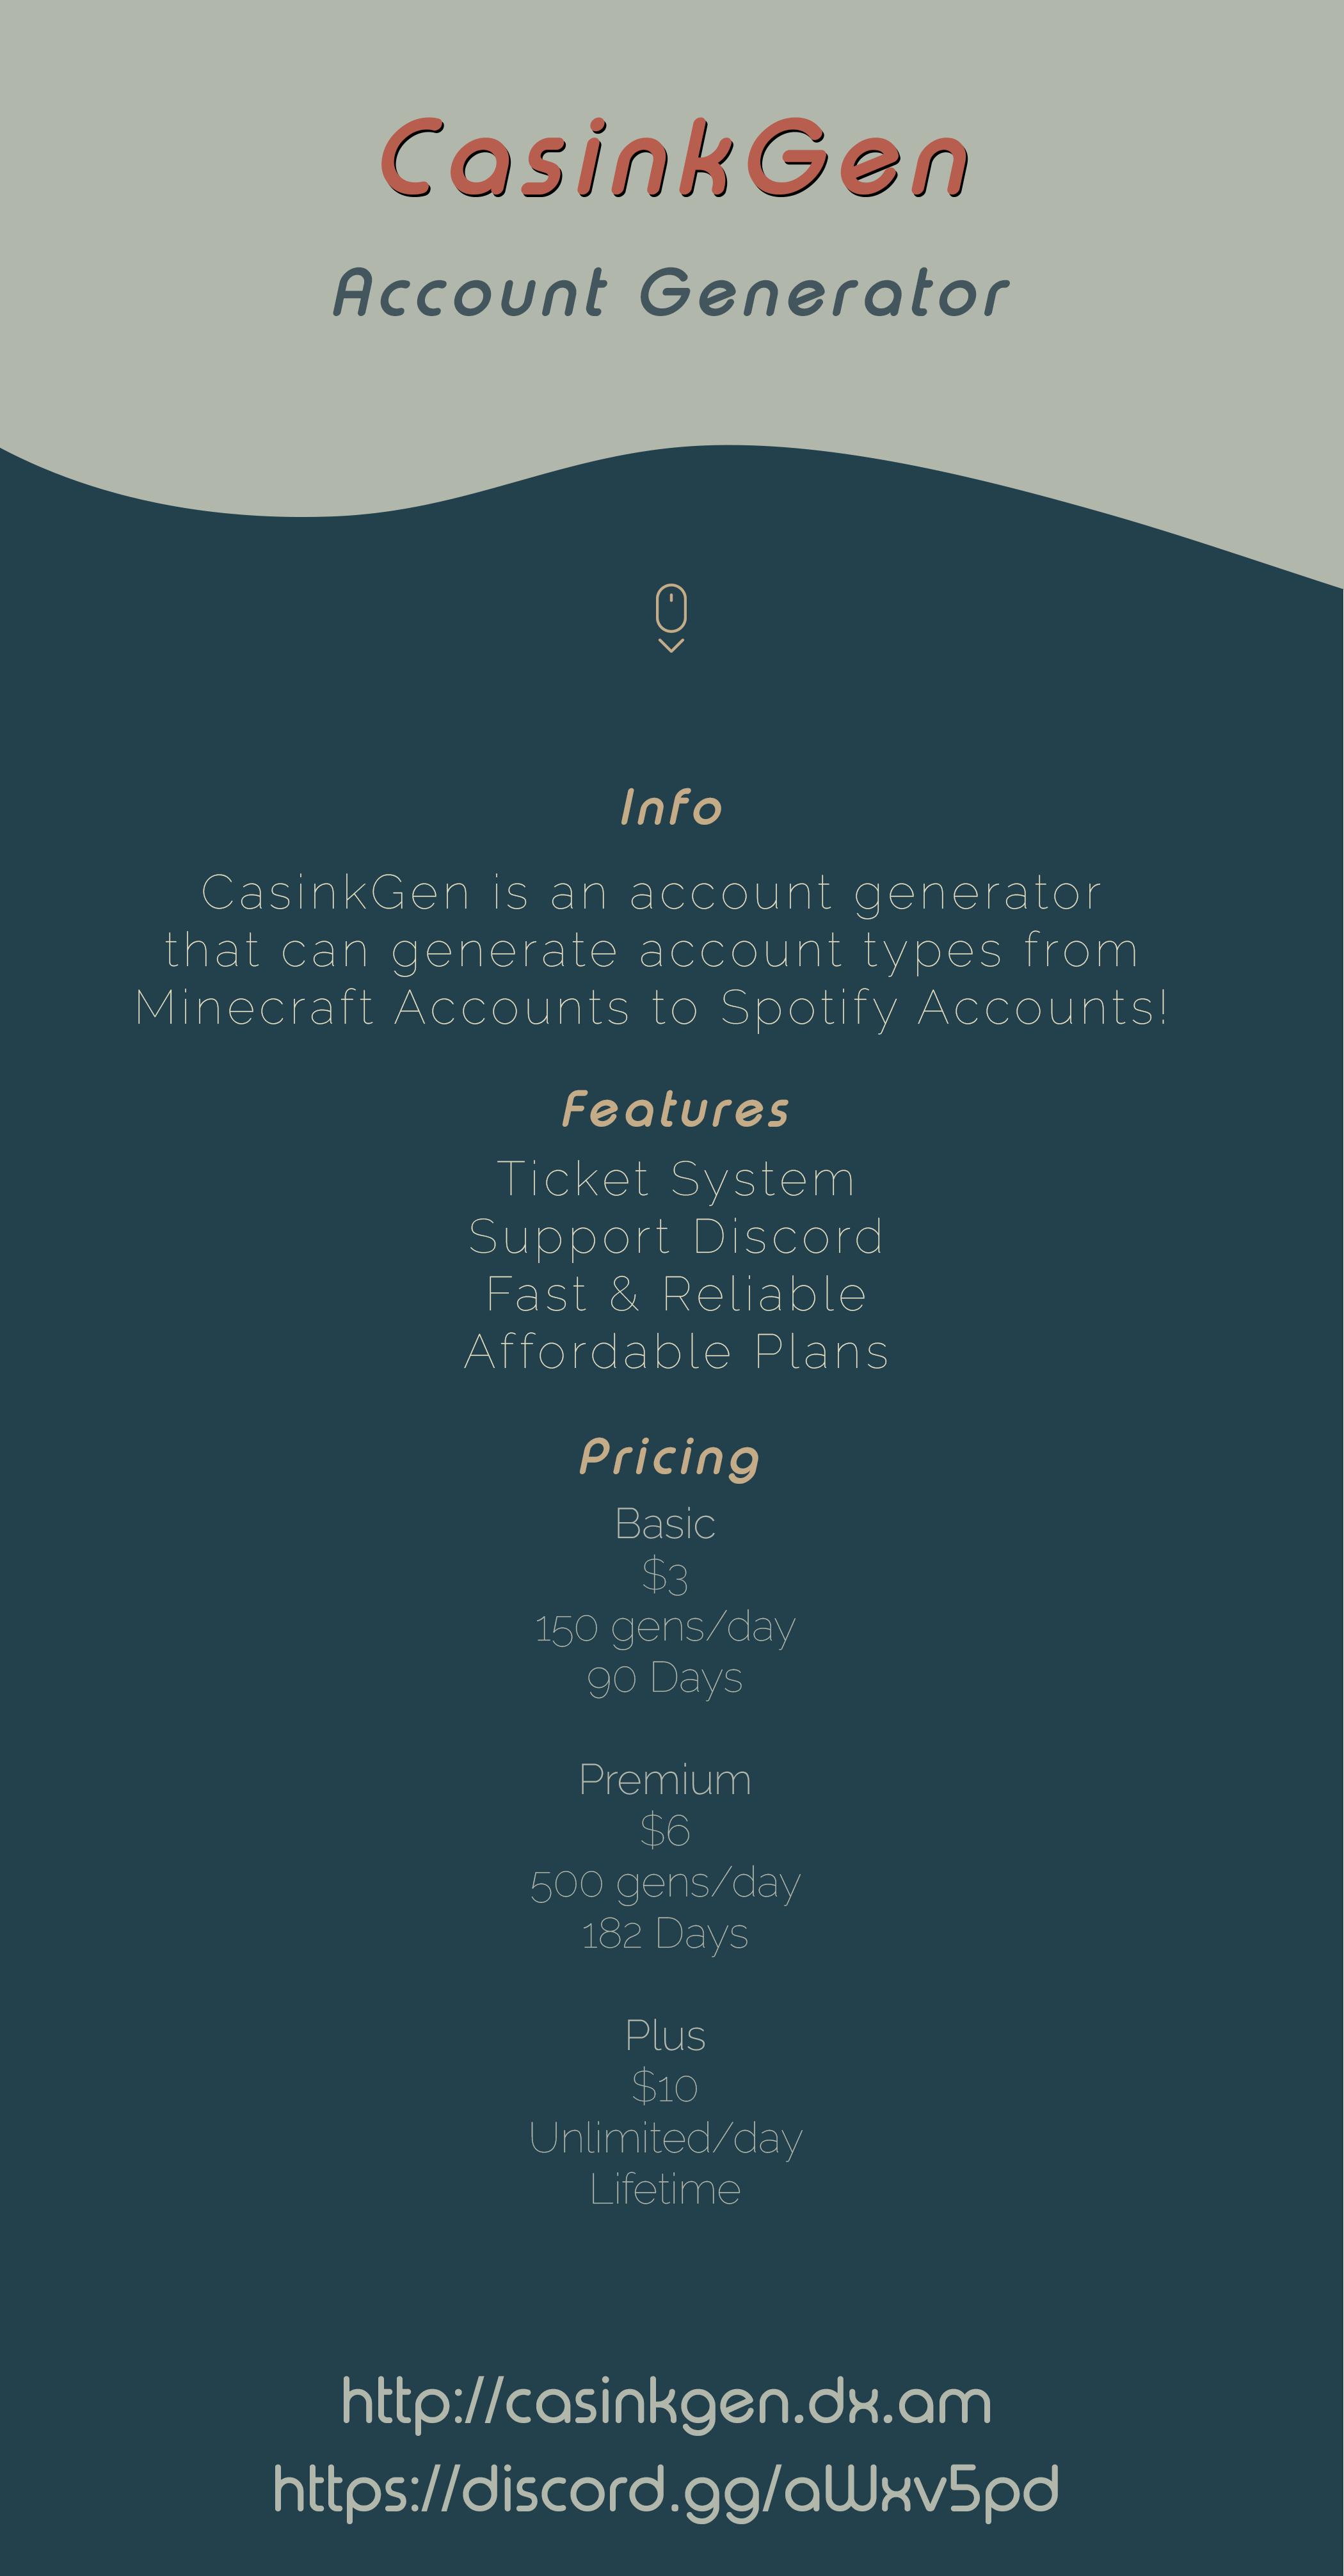 AD] Account Generator